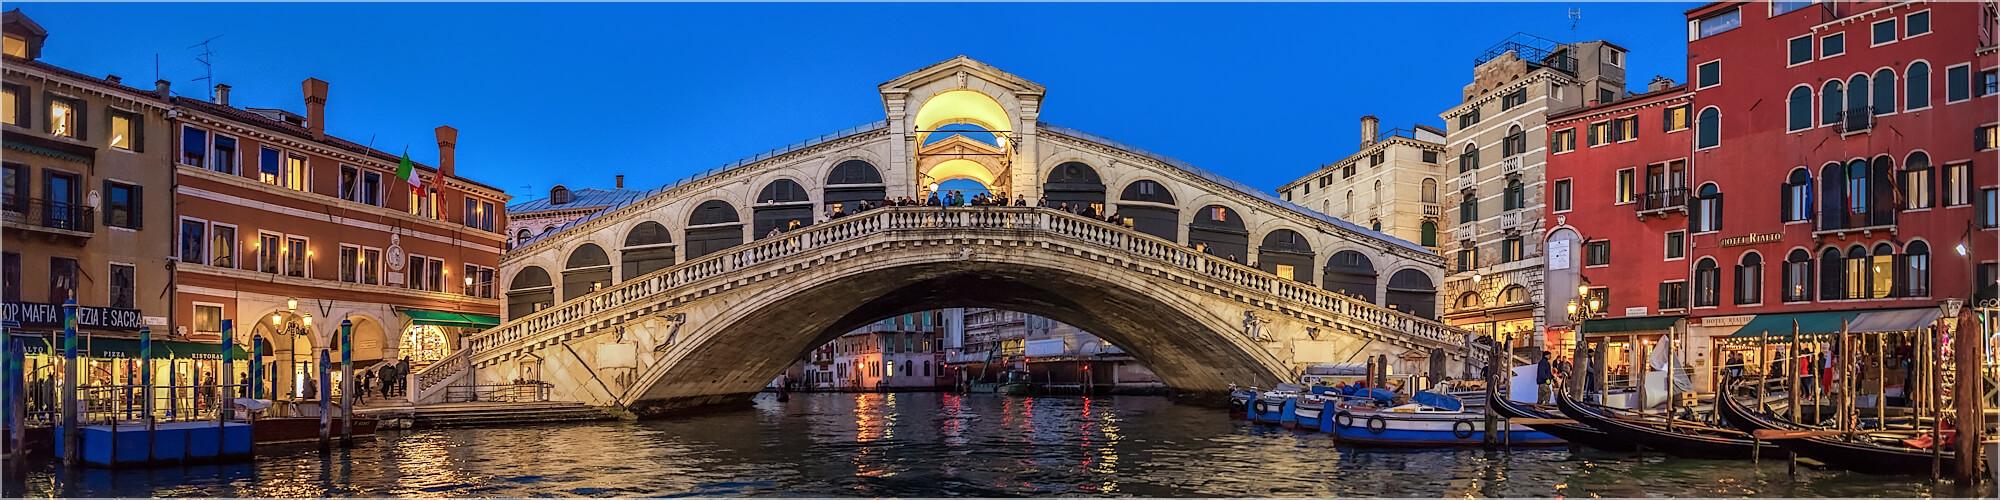 Panoramabild Rialto Brücke von Venedig Italien